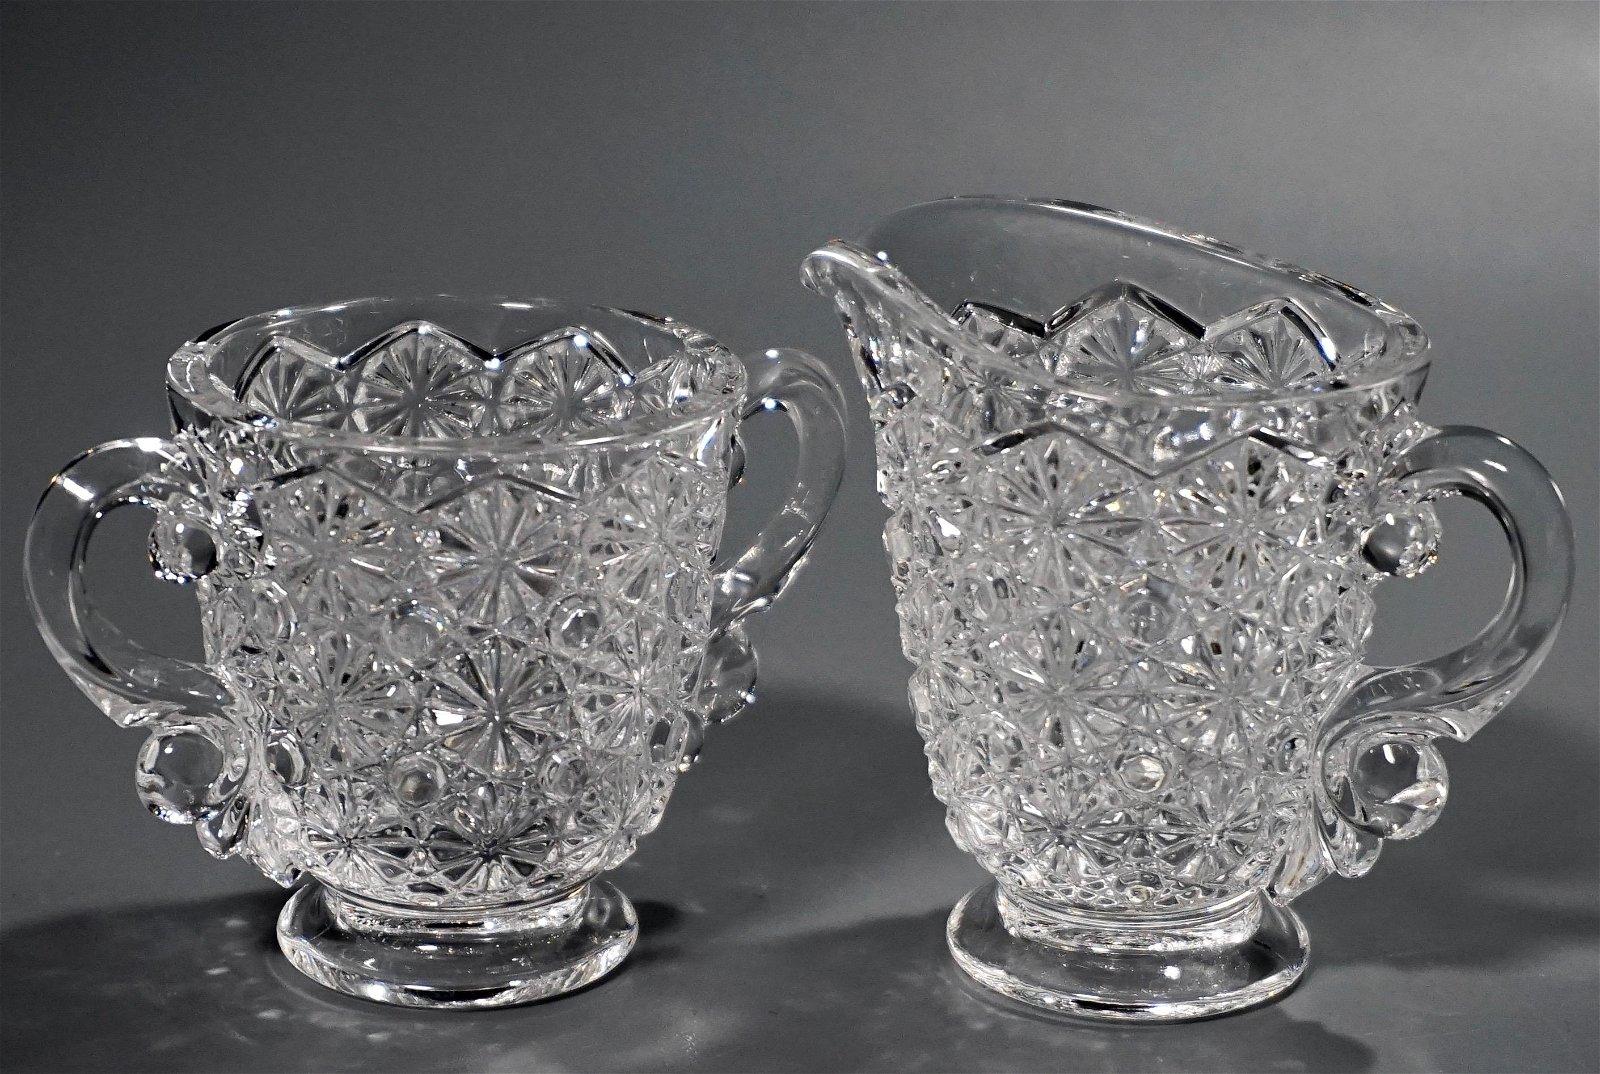 Vintage EAPG Pattern Glass Creamer and Sugar Set